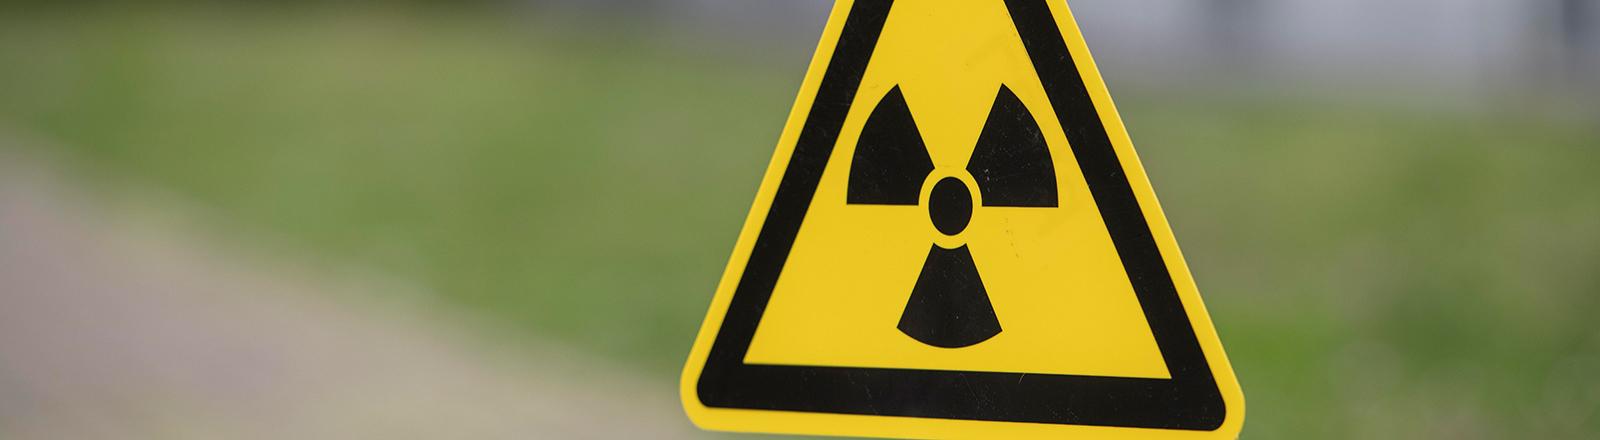 Strahlenwarnhinweisschild Atomkraft Radioaktivität